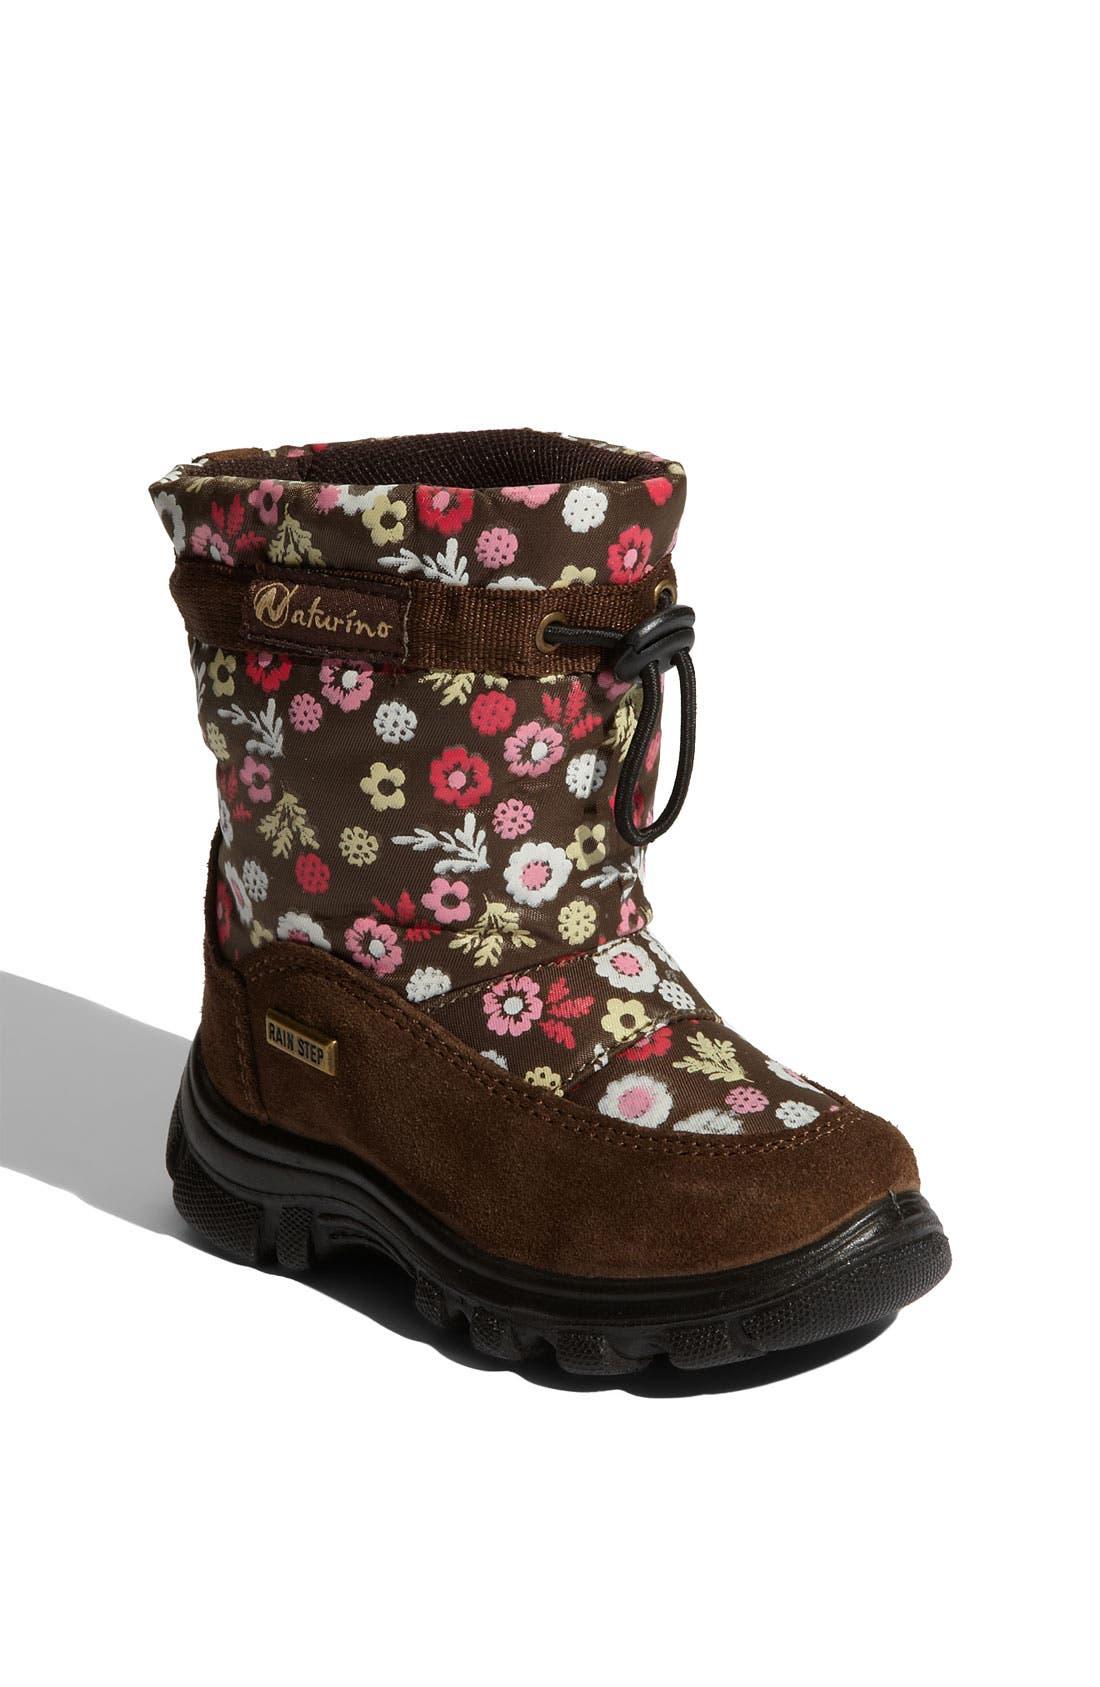 Main Image - Naturino 'Varna' Boot (Walker & Toddler)